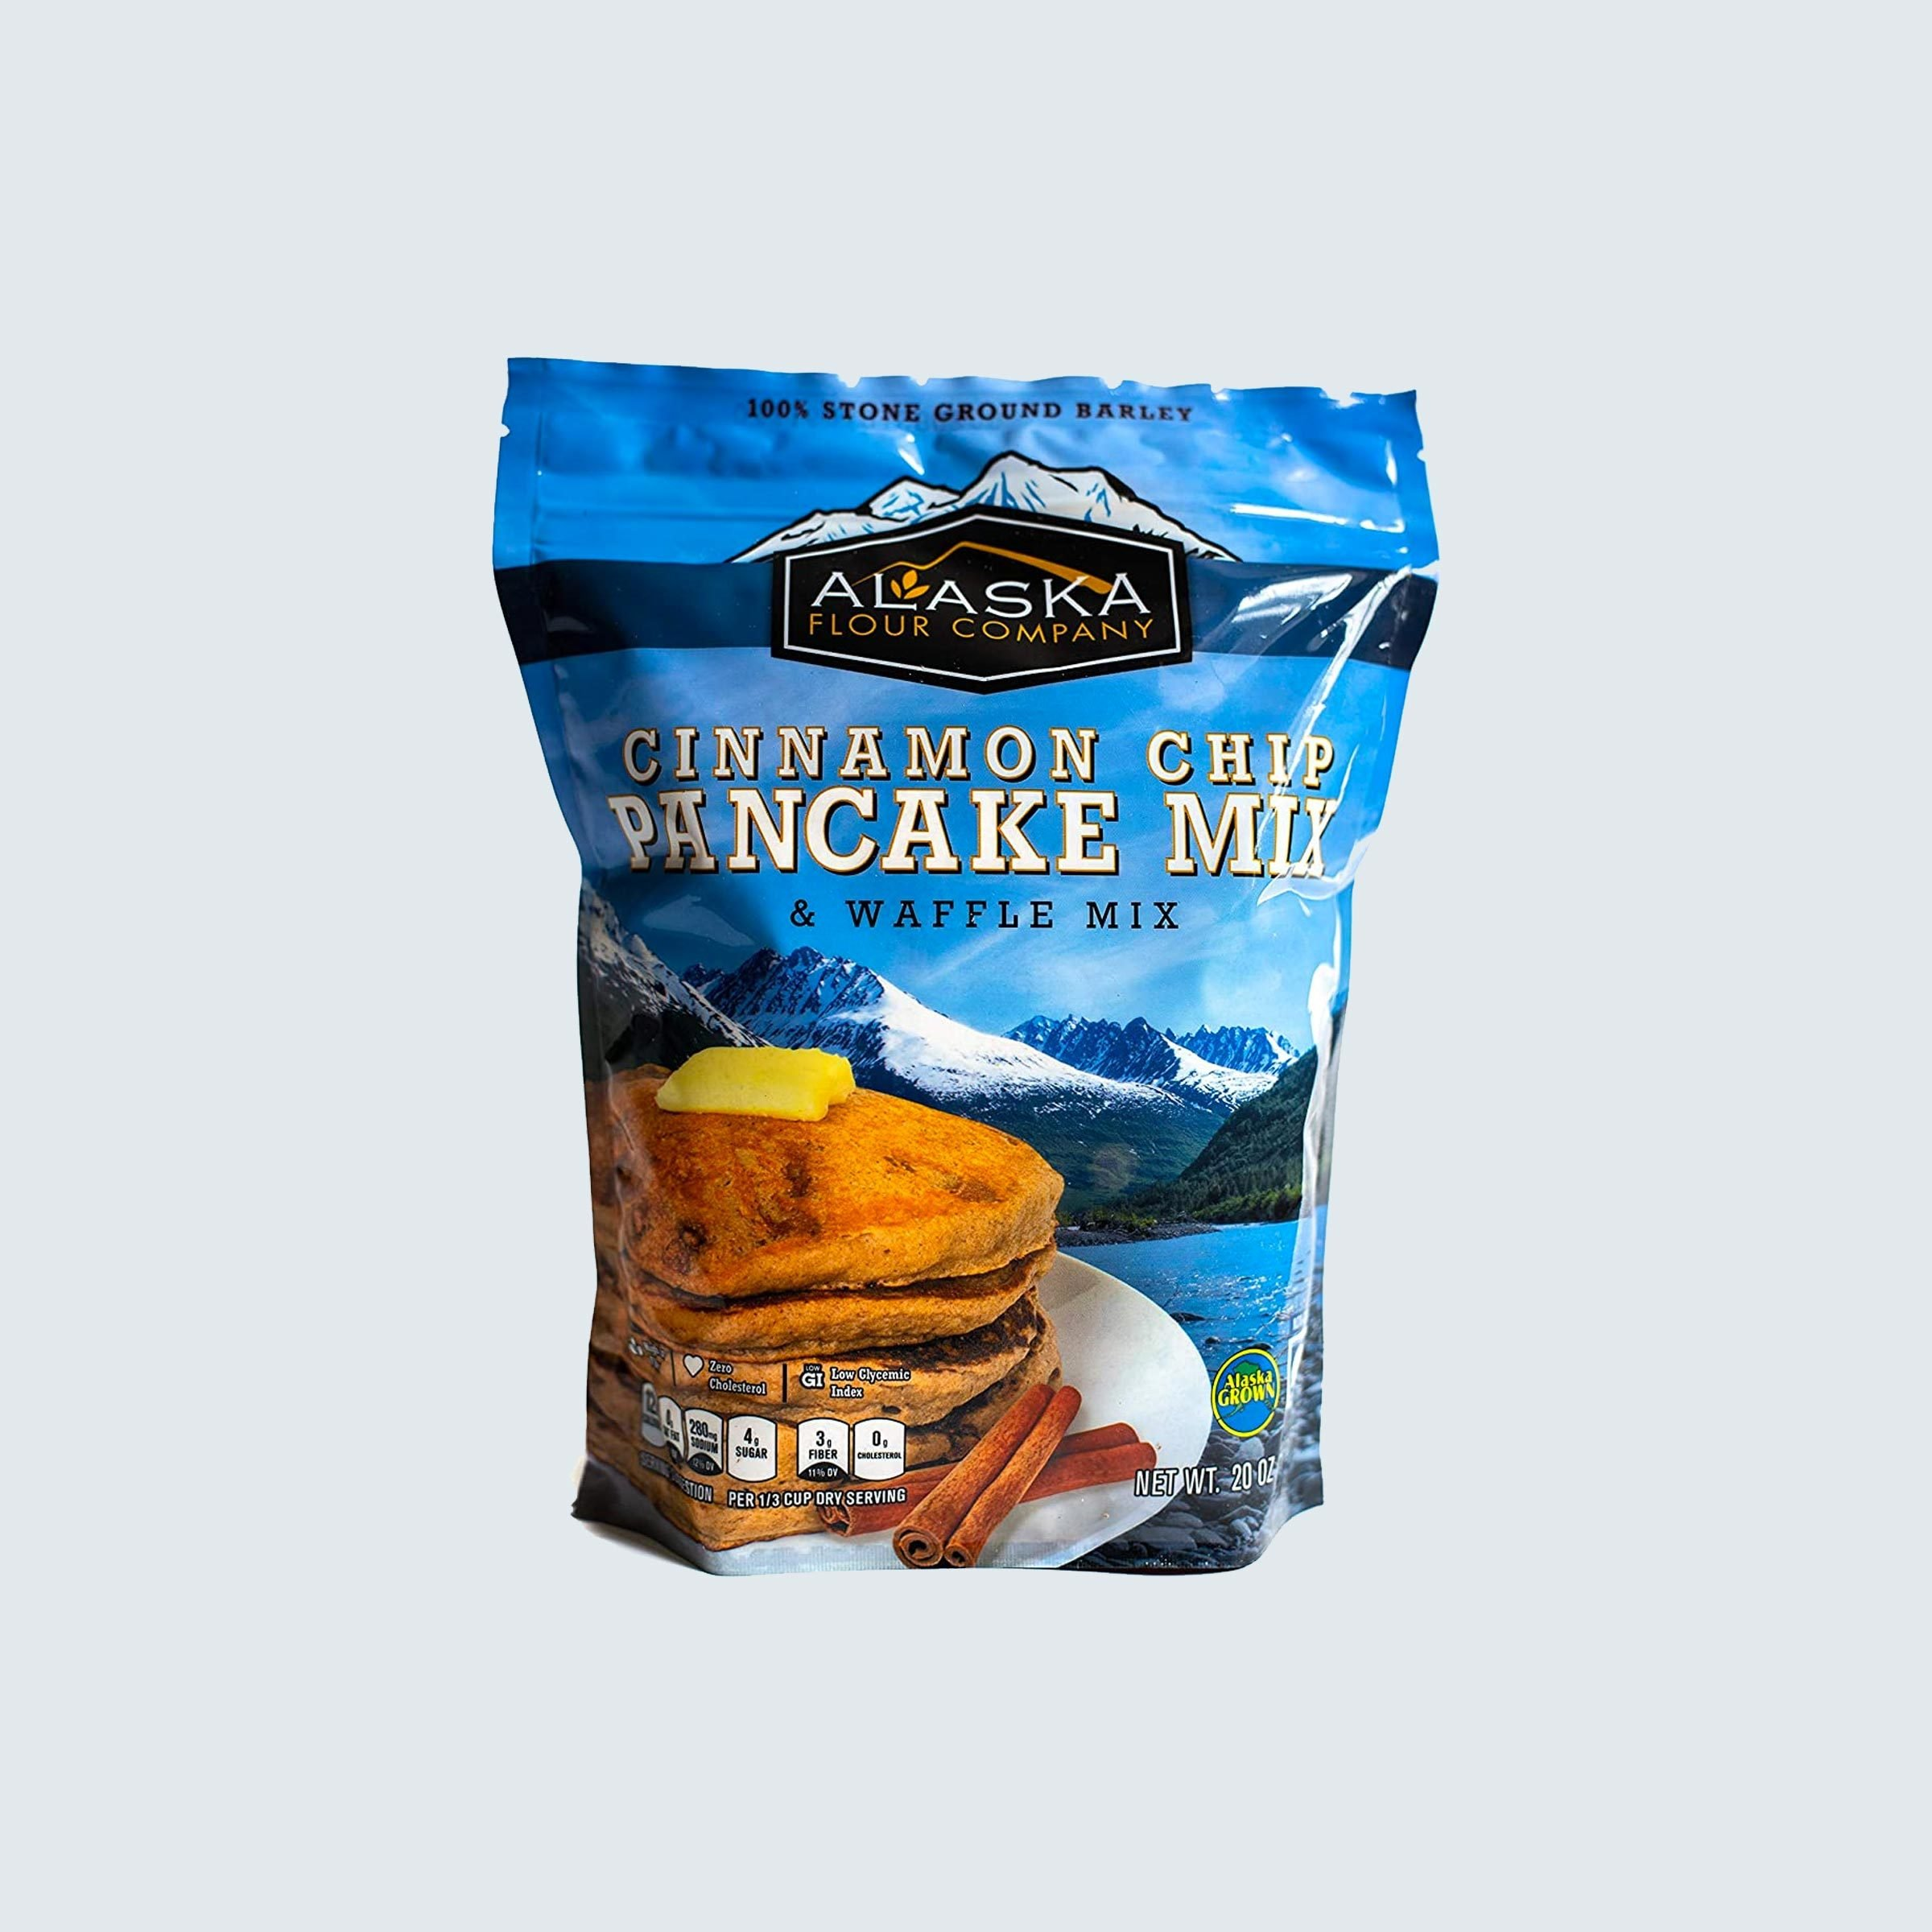 Alaskan Barley Flour products